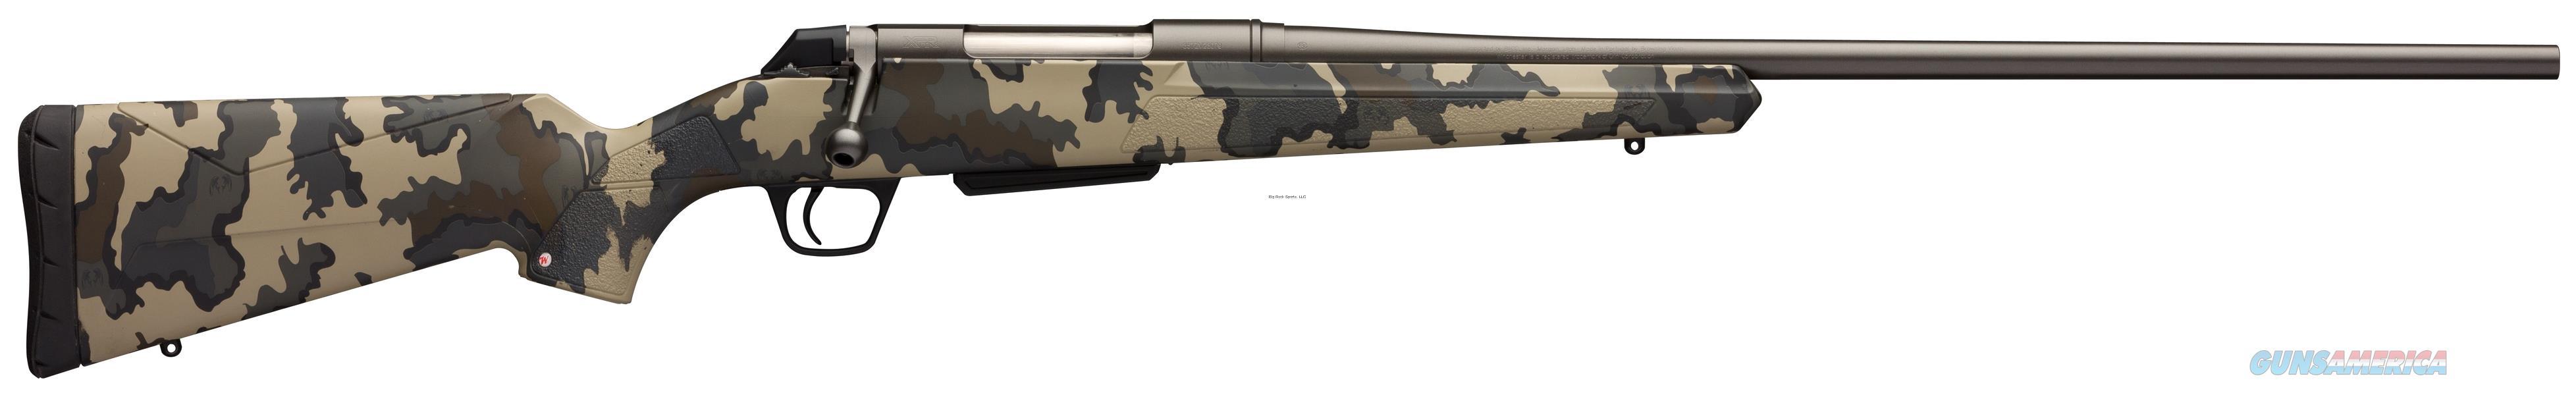 "Winchester Xpr Hunter Vias Bolt Action Rifle, 308 Win, 22"" Bbl, Permacote Gray Barrel, Vias Camo Stock 535713220  Guns > Rifles > W Misc Rifles"